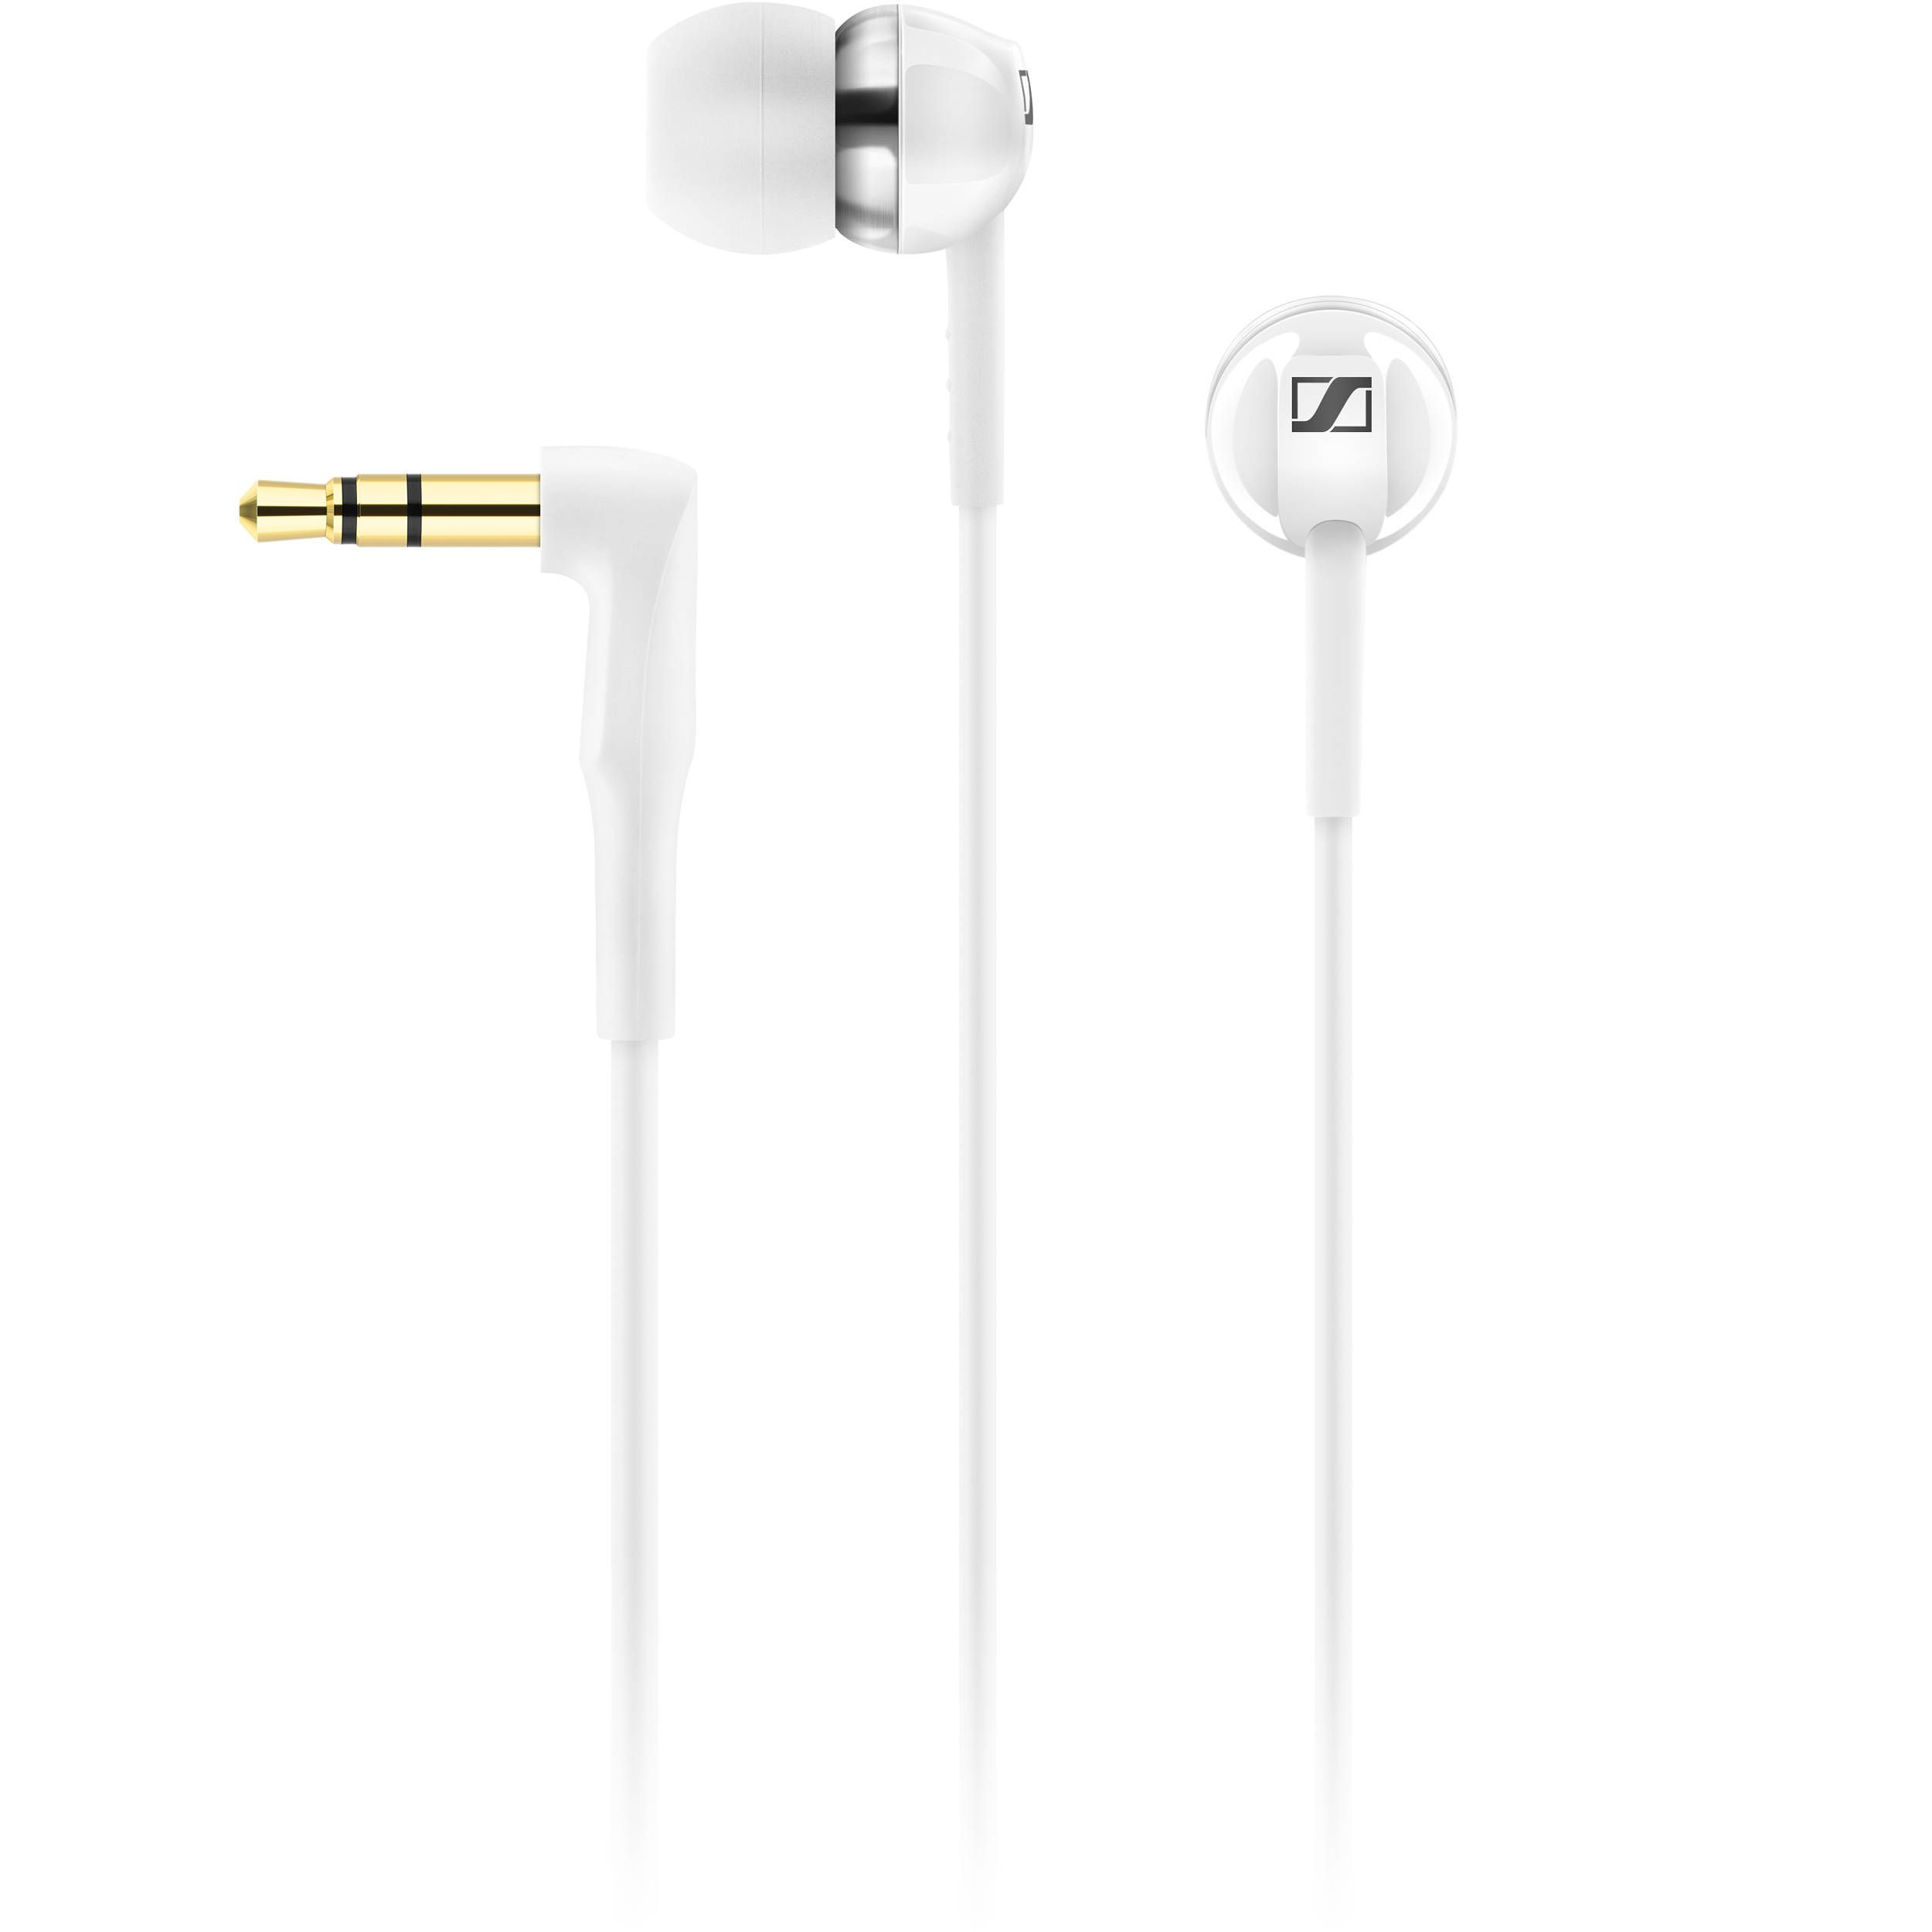 Sennheiser CX 100 In-Ear Headphone